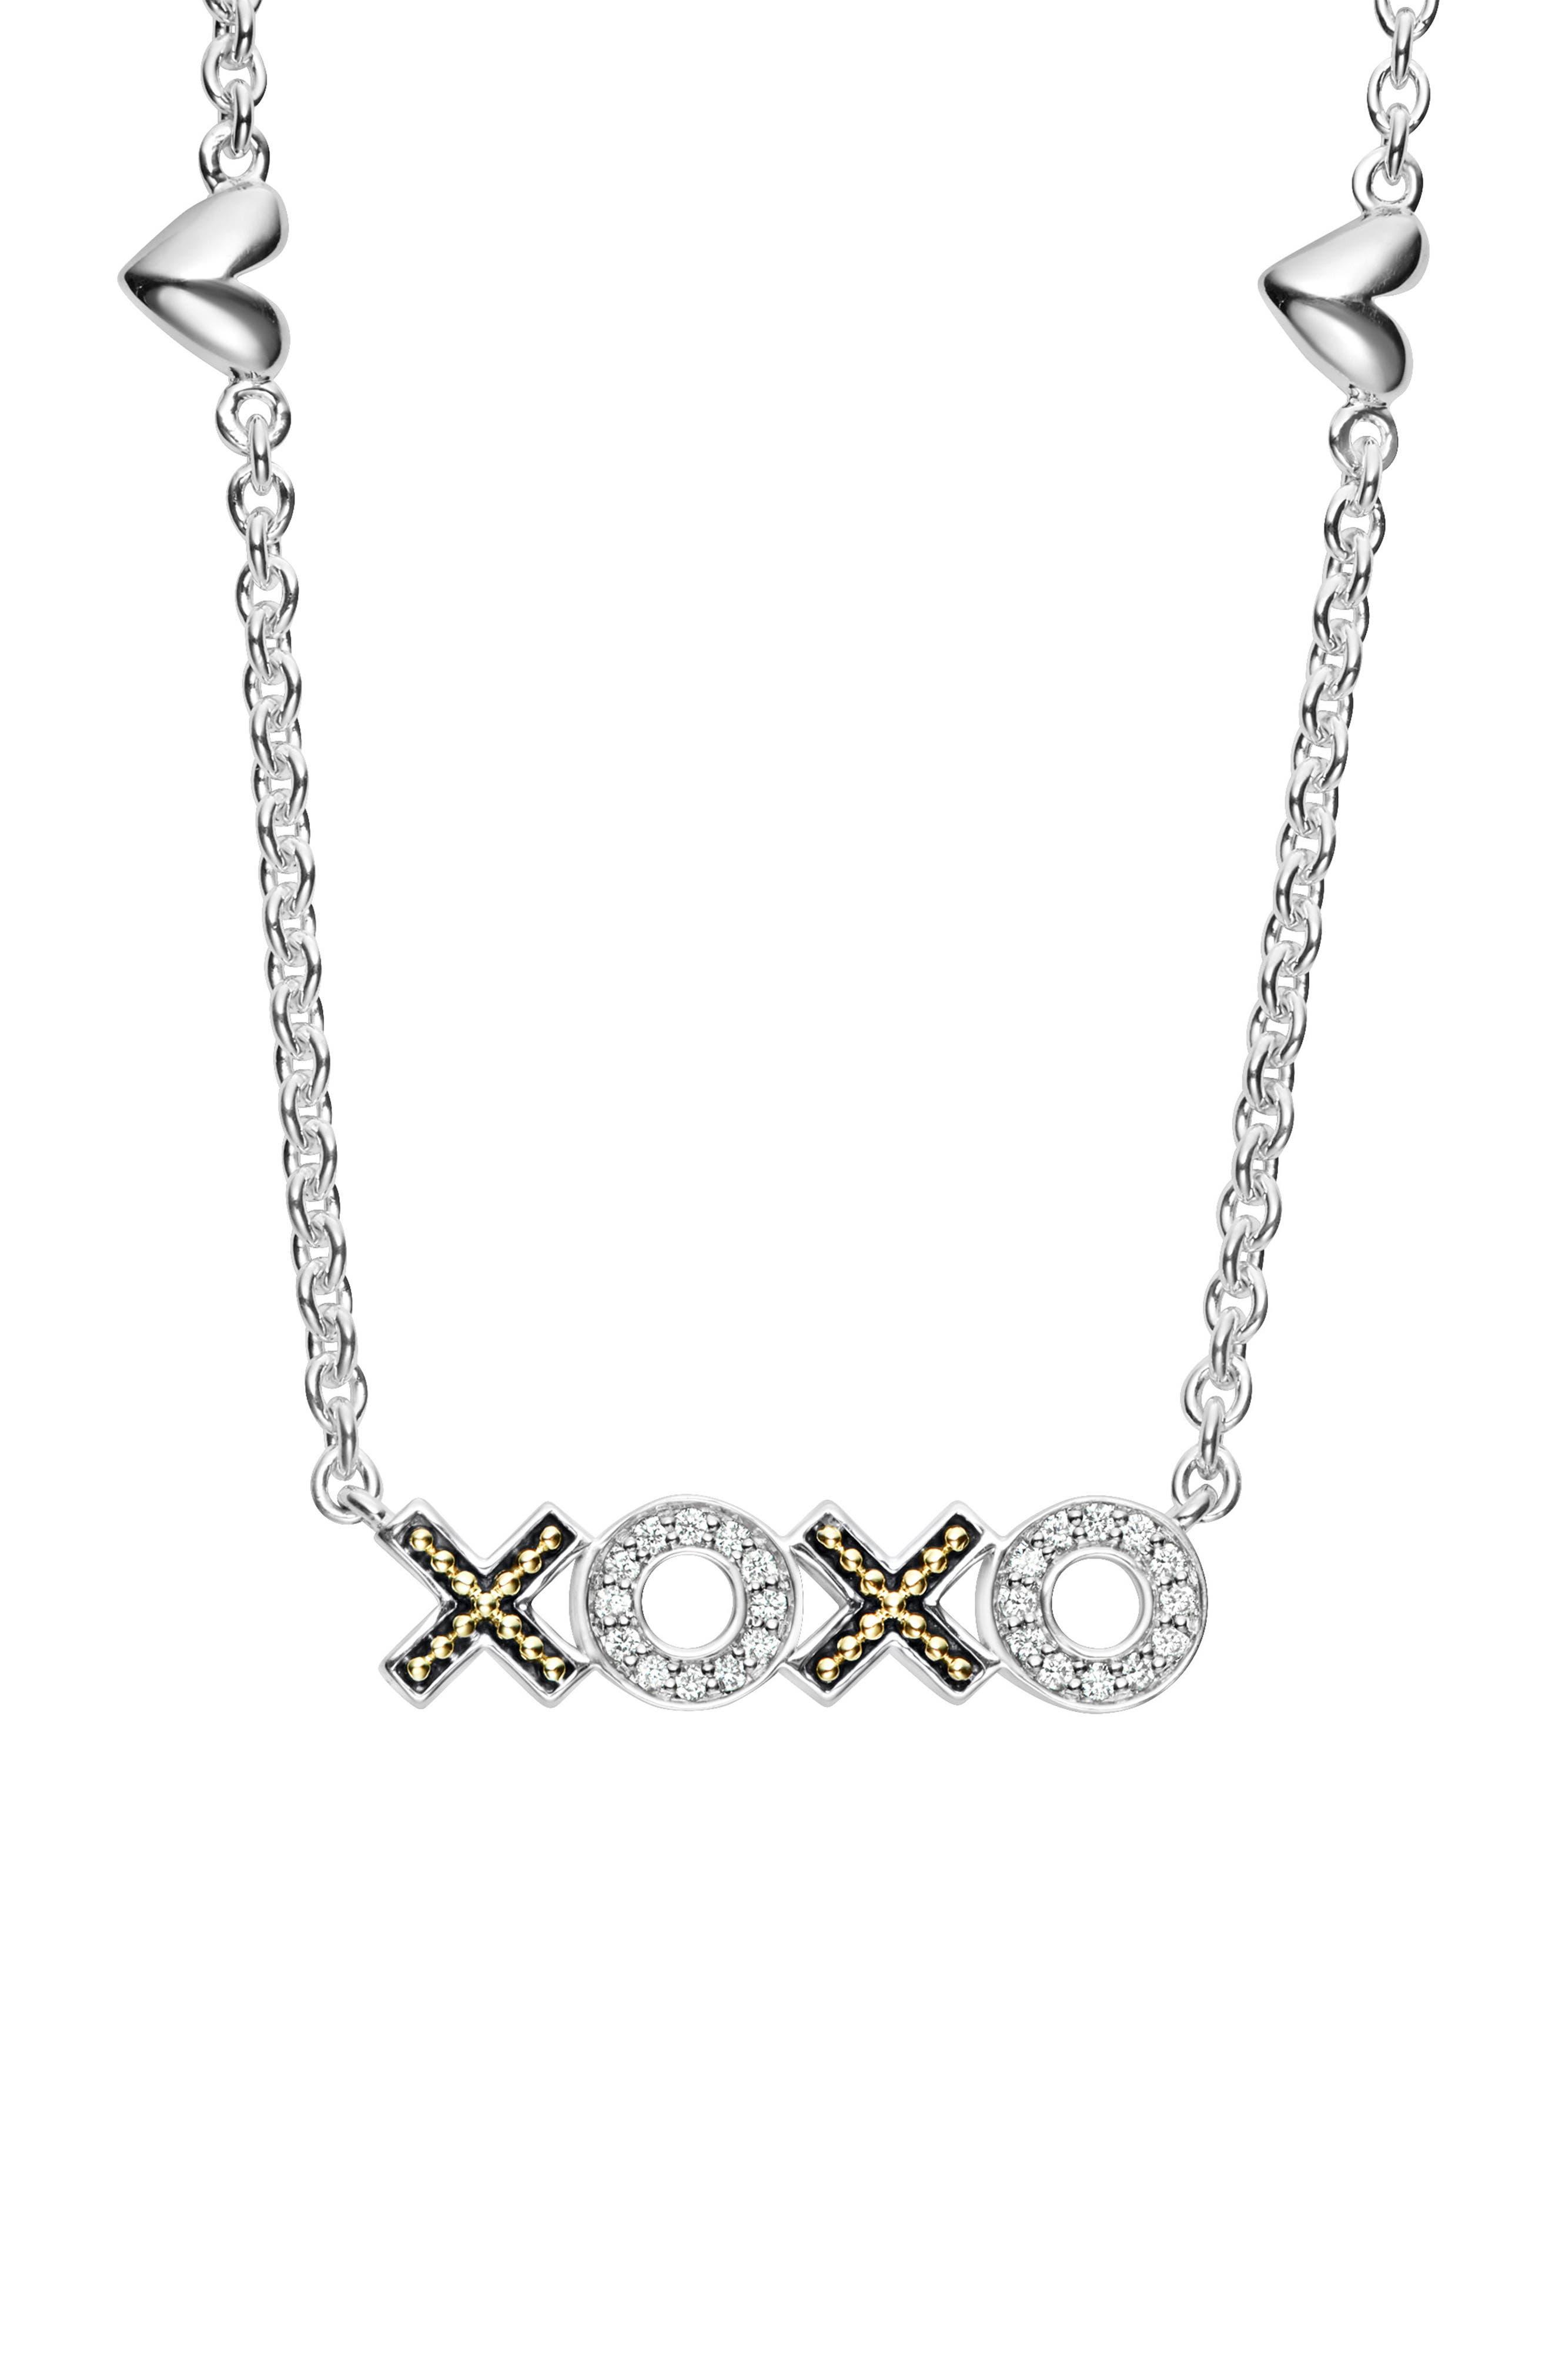 Beloved Diamond XOXO Chain Necklace,                             Alternate thumbnail 3, color,                             Silver/ Diamond